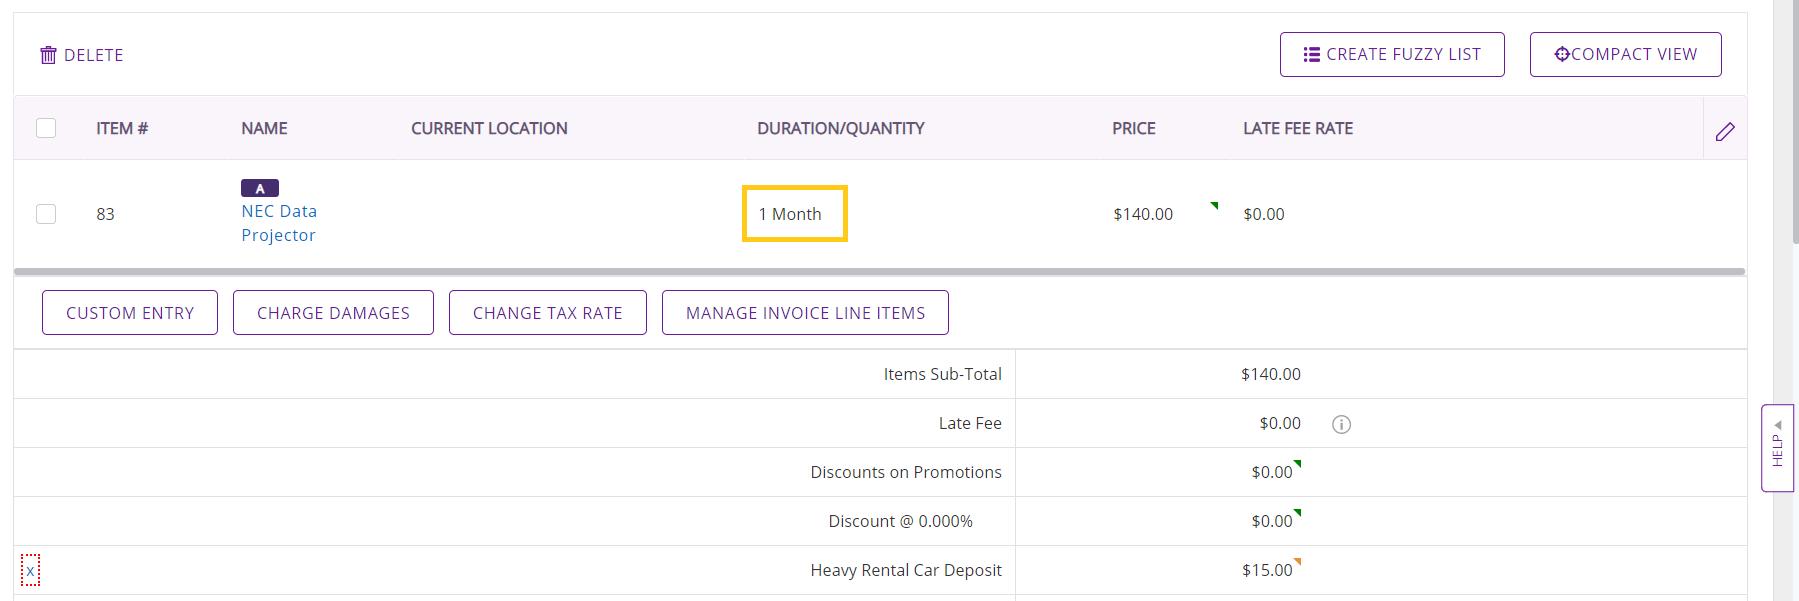 Payable month $140